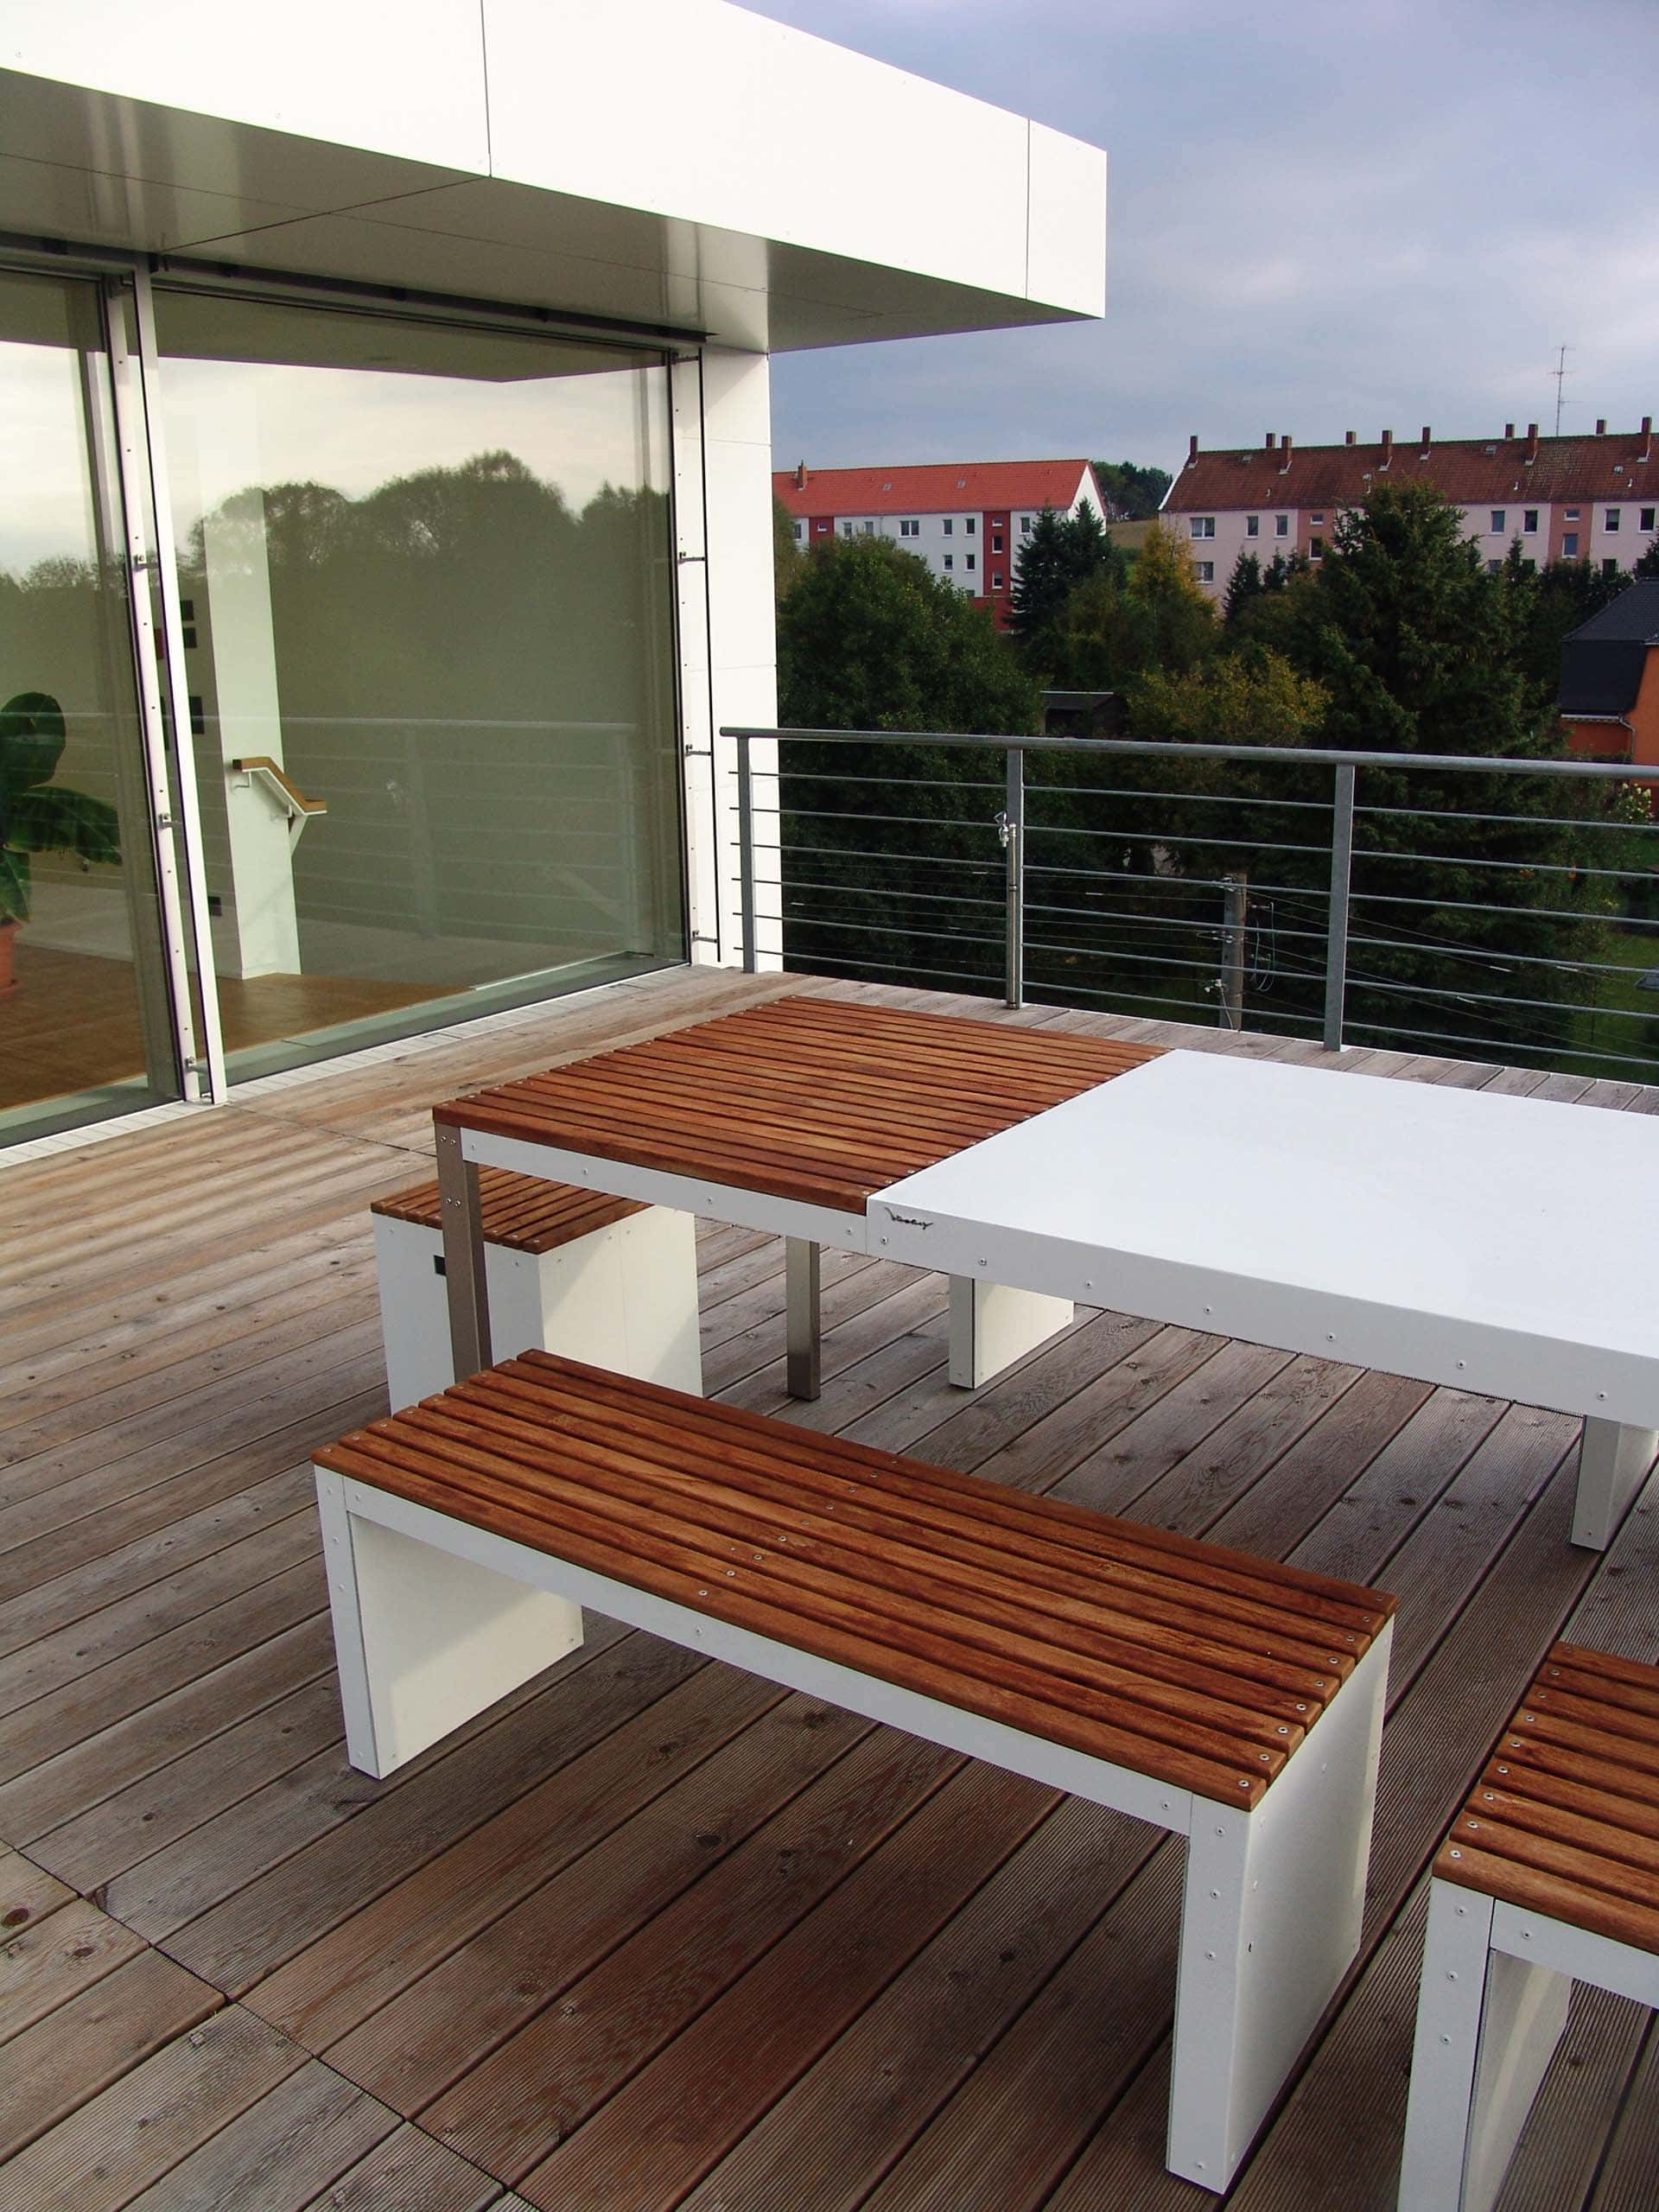 Design Tisch Sealine Nummer 2 aus Holz Edel-Stahl by Sebastian Bohry